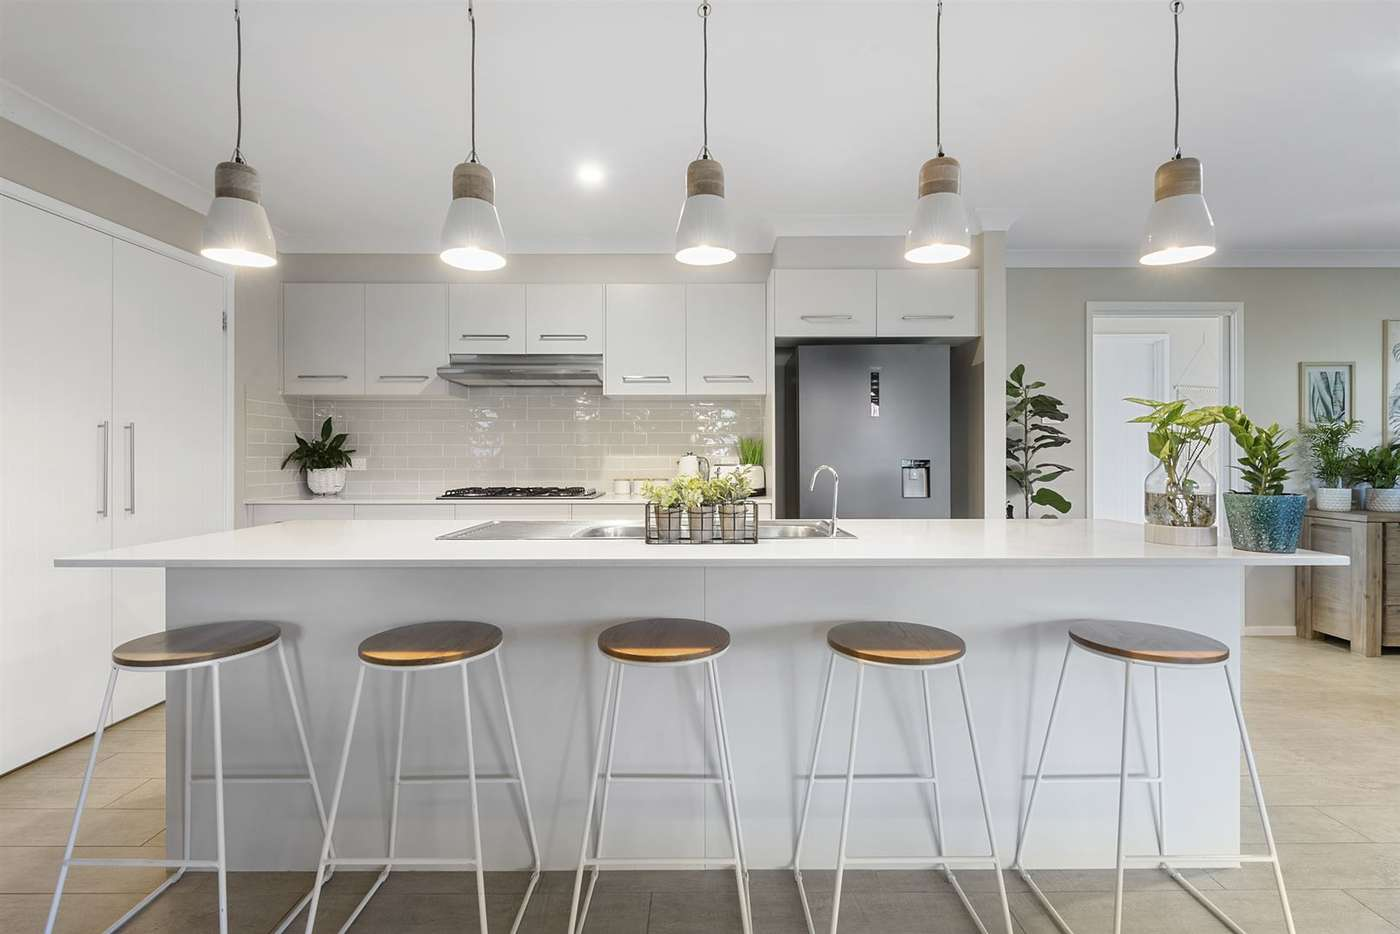 Main view of Homely house listing, 147 Lake Conjola Entrance Road, Lake Conjola NSW 2539